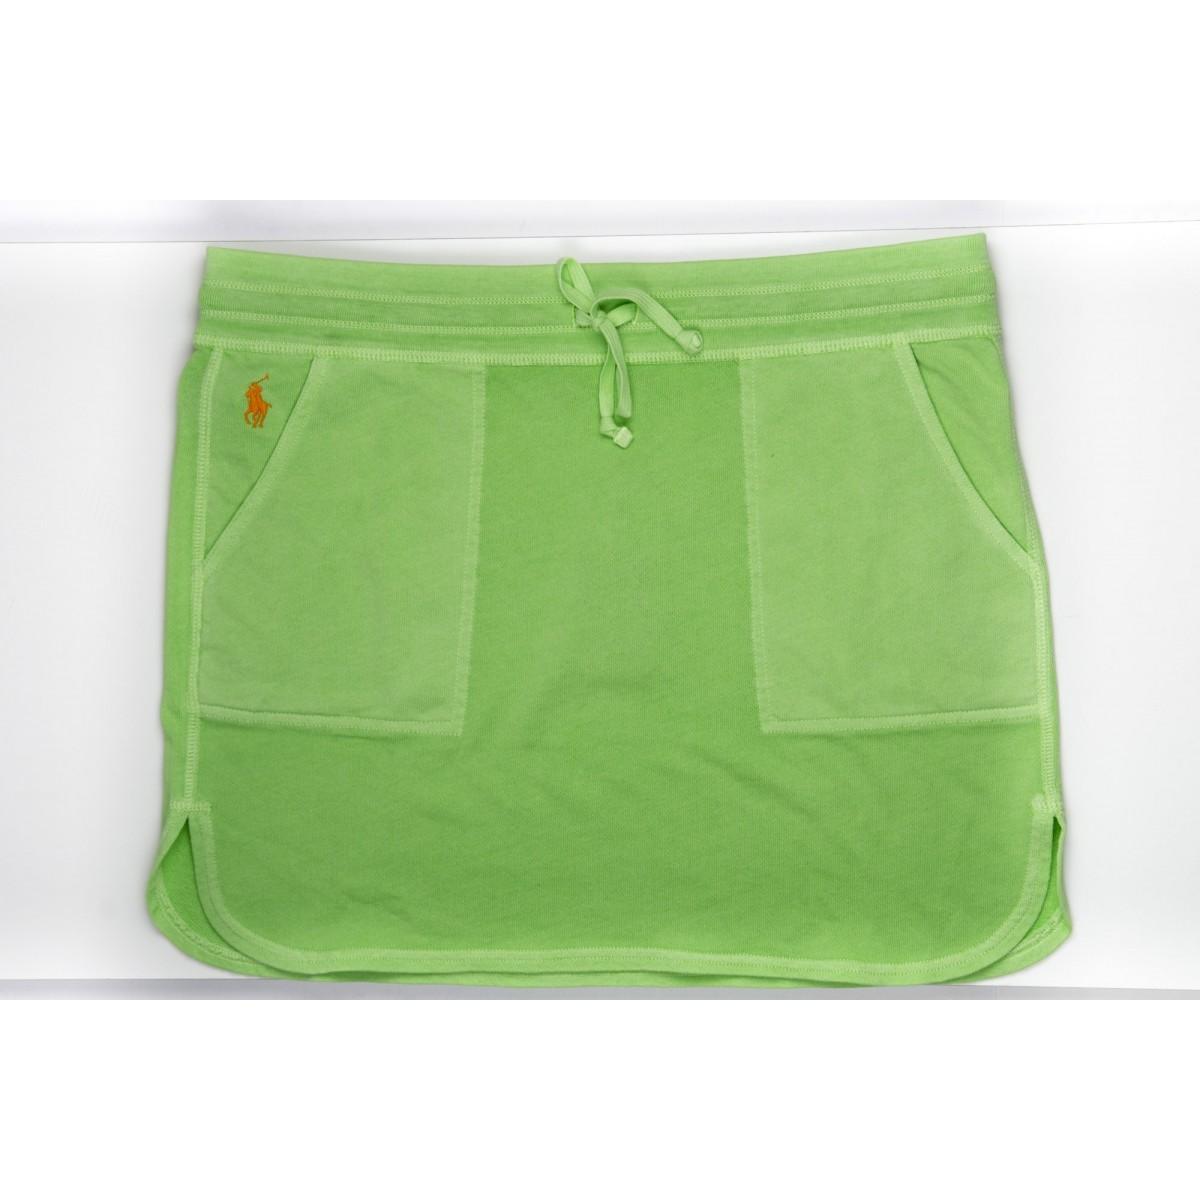 Gonna corta Ralph lauren - V38ir839br102 B3R00 - Verde